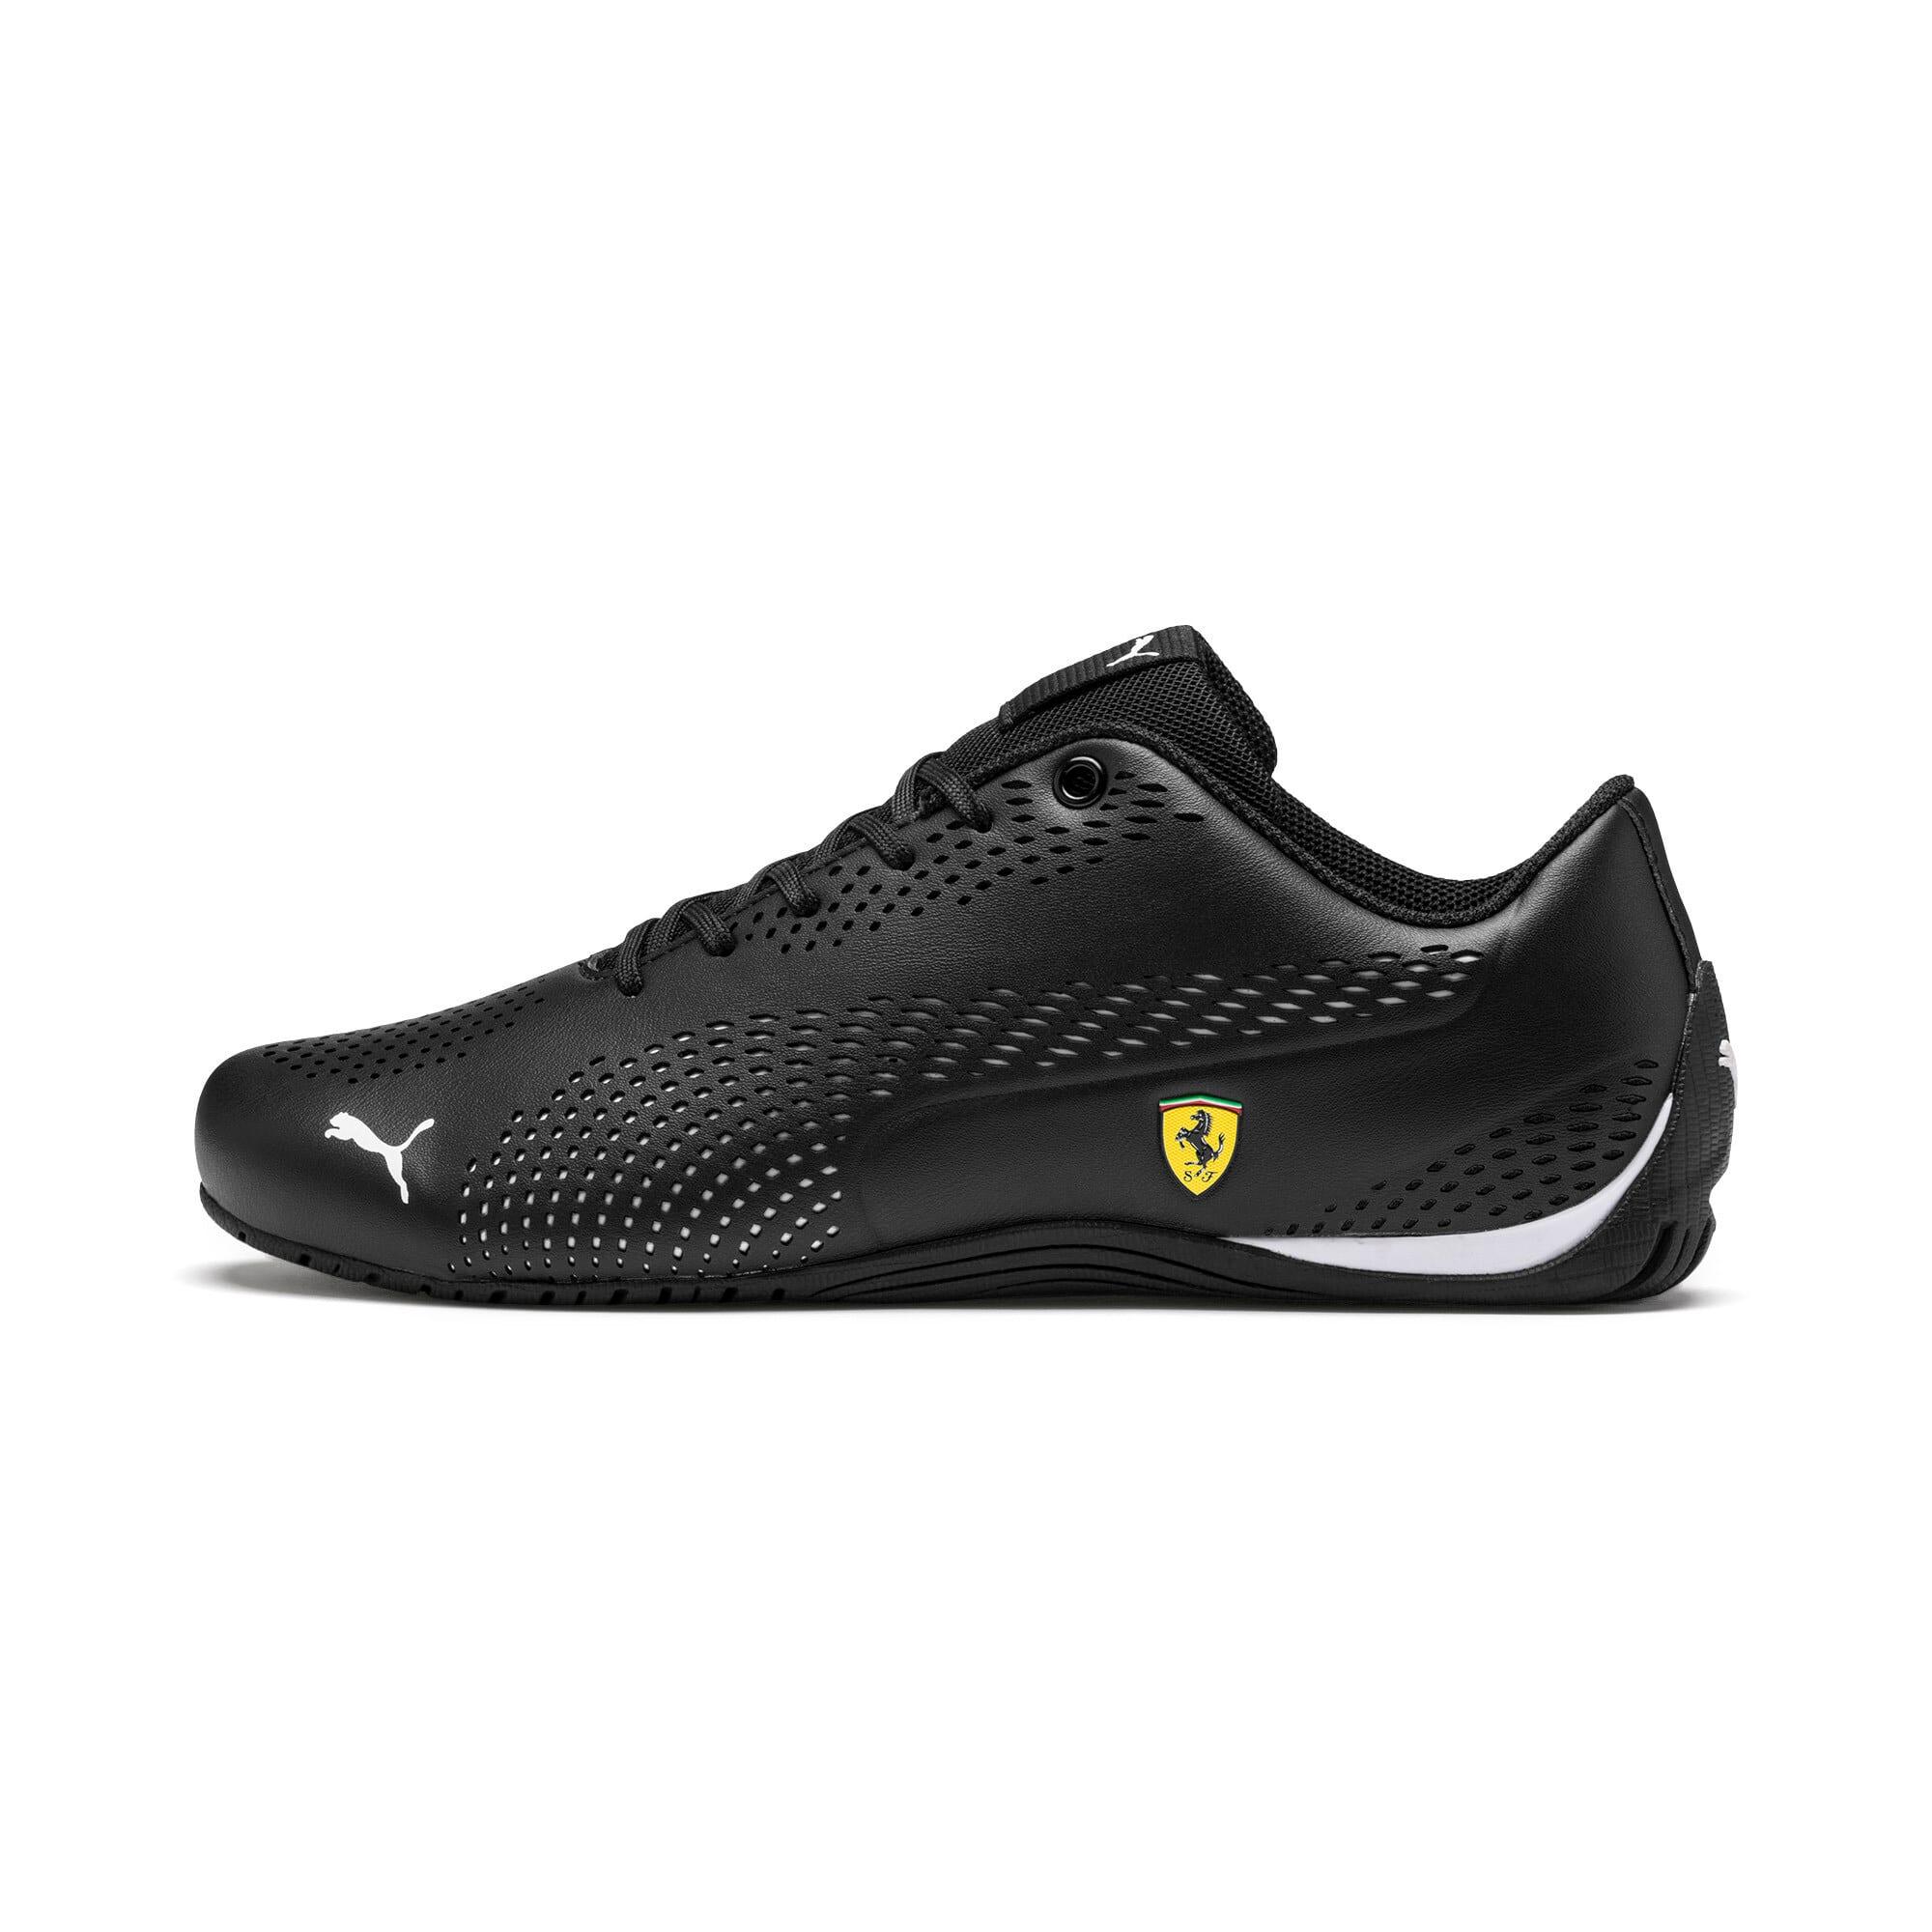 Thumbnail 1 of Scuderia Ferrari Drift Cat 5 Ultra II Shoes, Puma Black-Puma White, medium